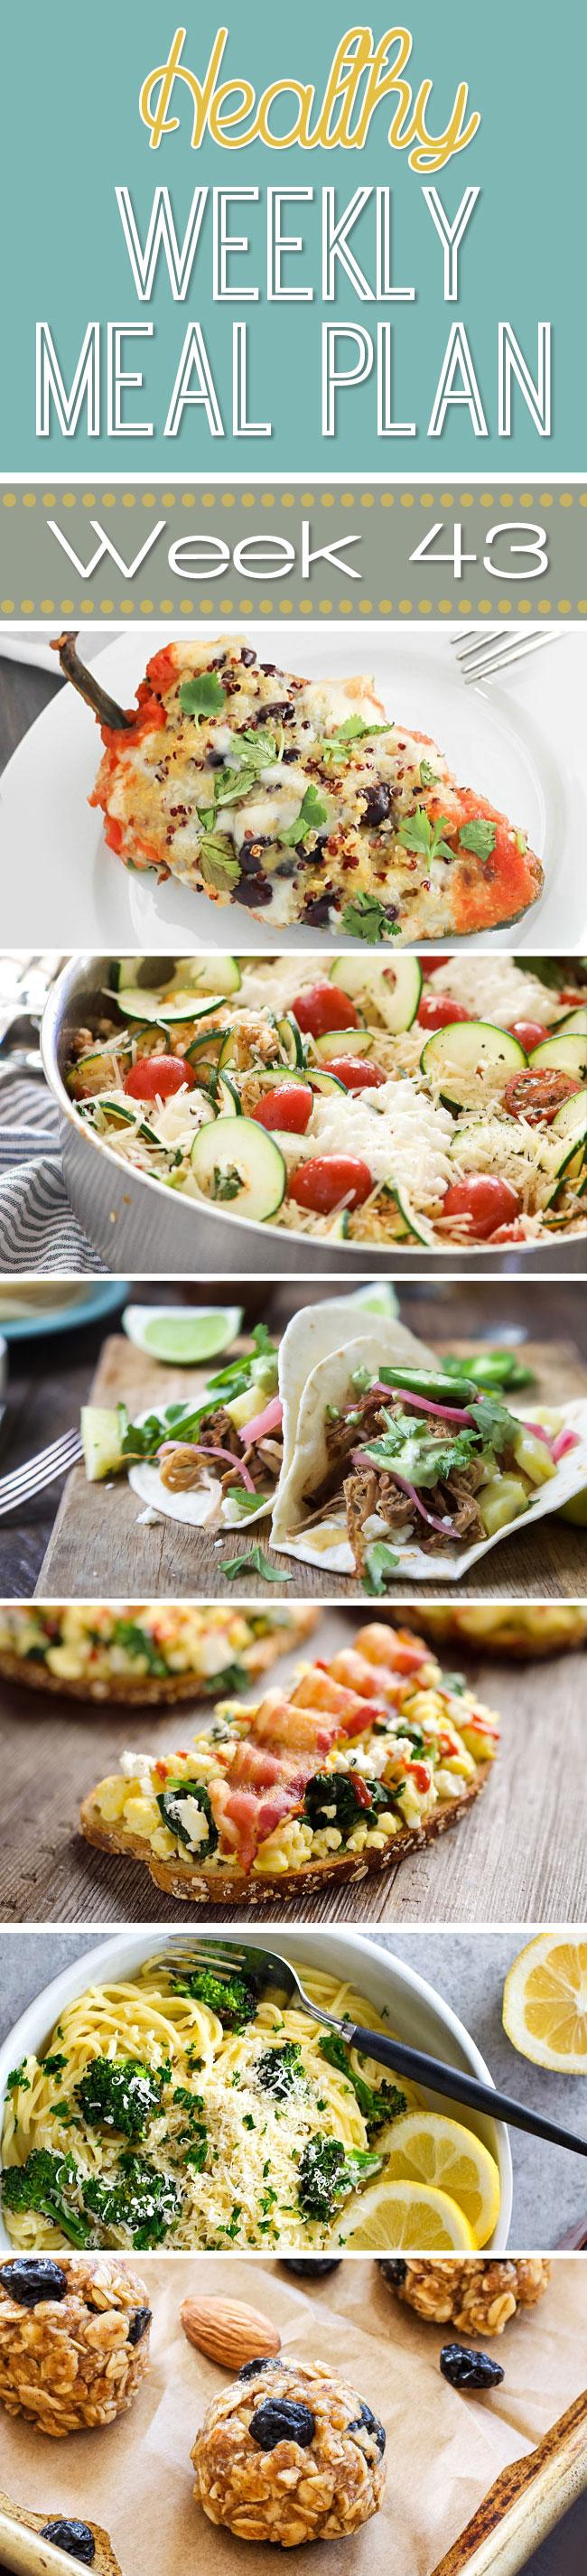 Healthy Weekly Meal Plan #43